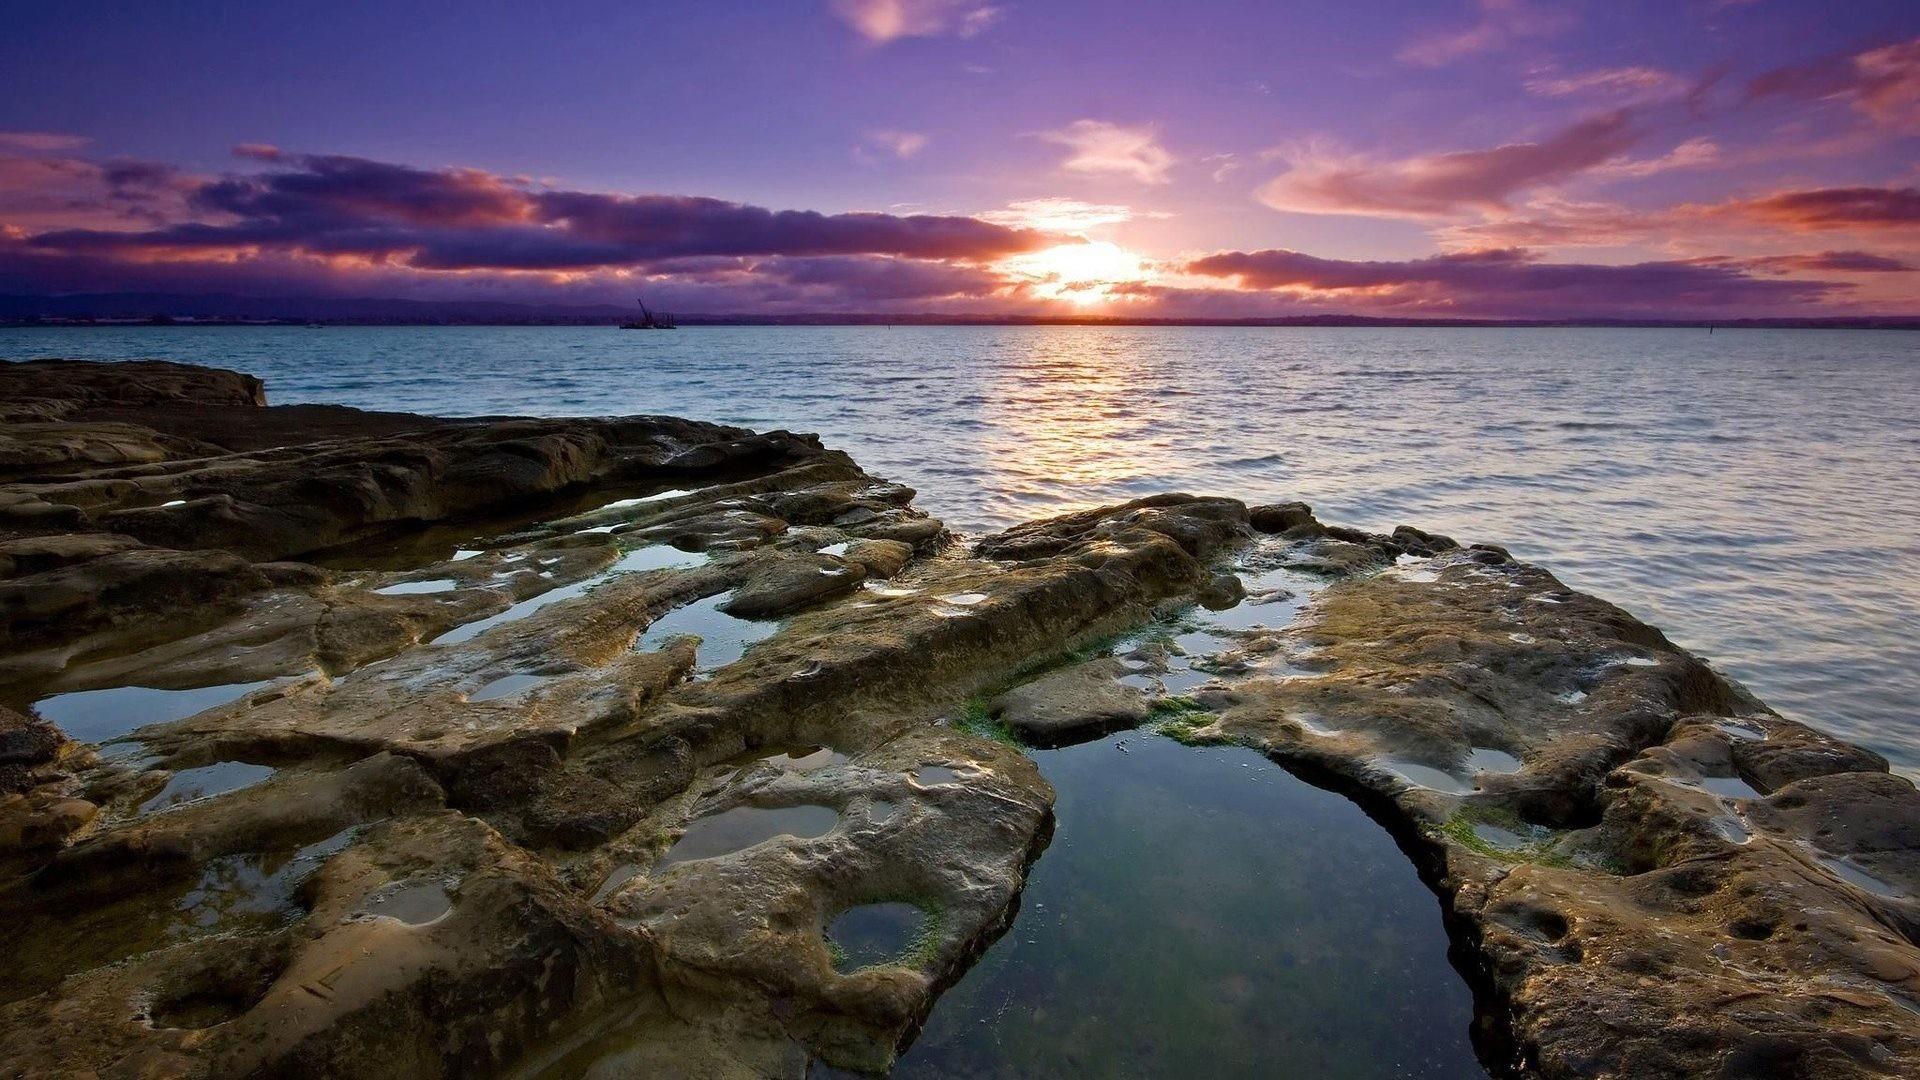 Rocky Tag – Beaches Ocean Sunset Coast Sea Clouds Shore Sky Rocky Landscape  Nature Wallpaper Hd